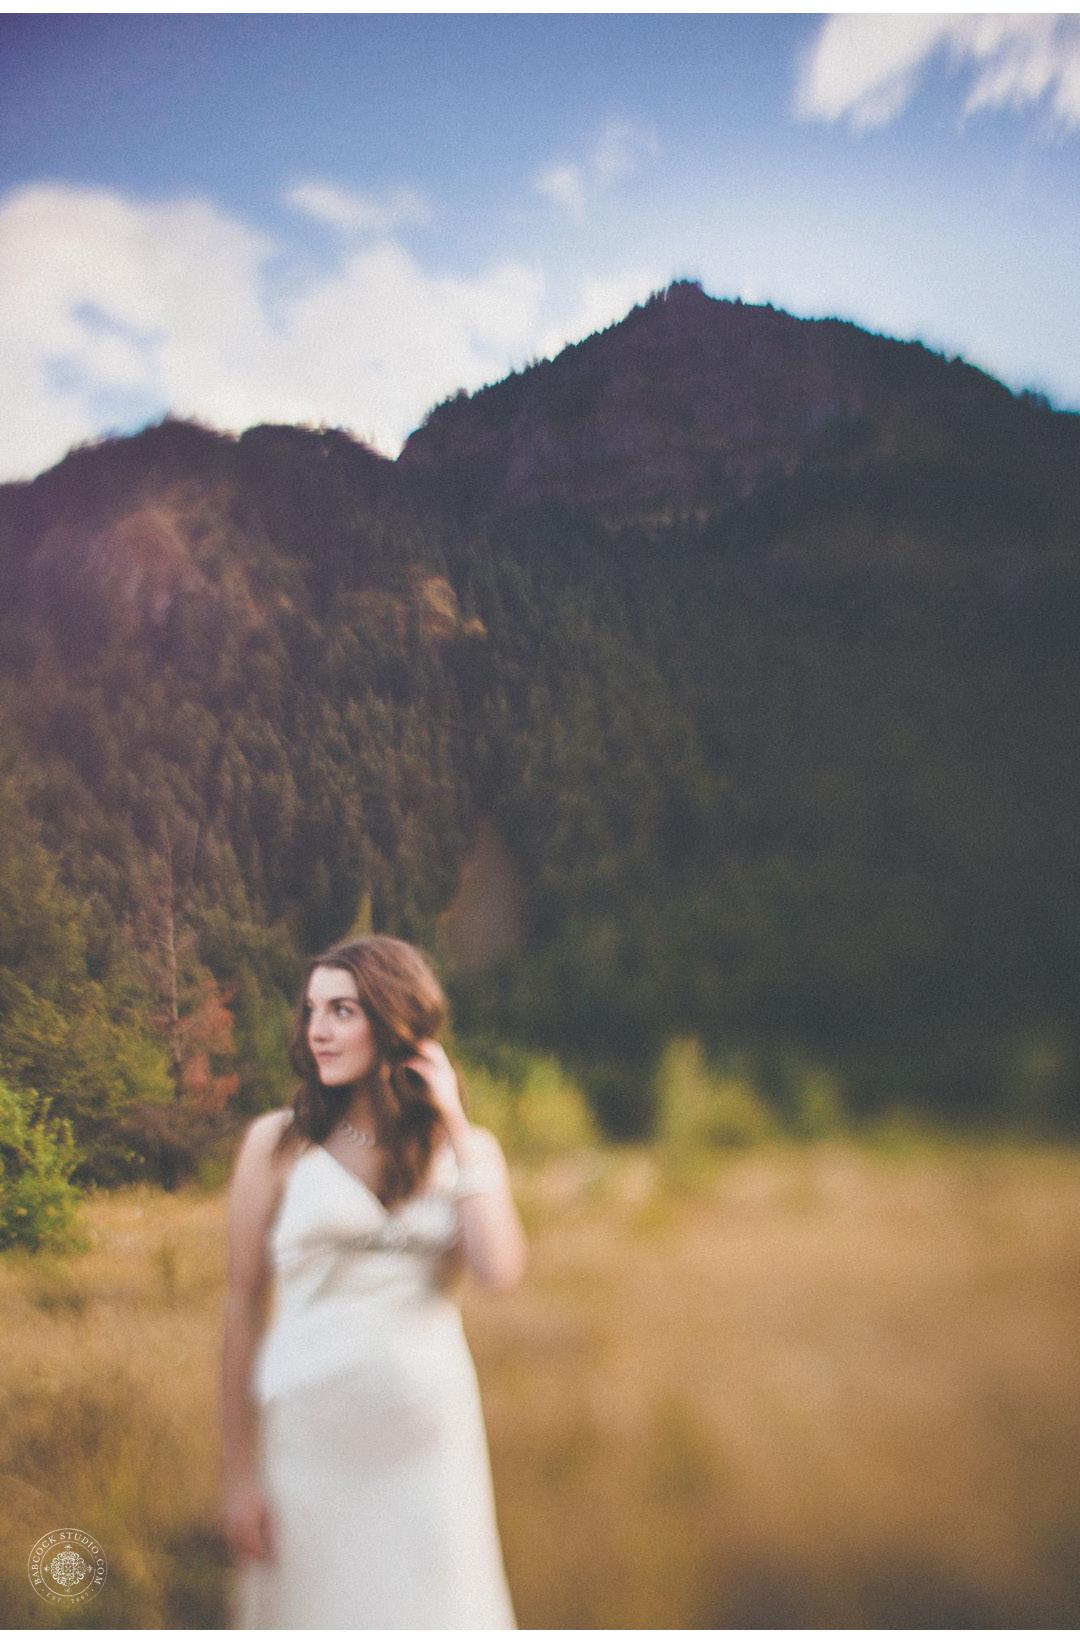 steph-dallas-destination-photographer-14.jpg